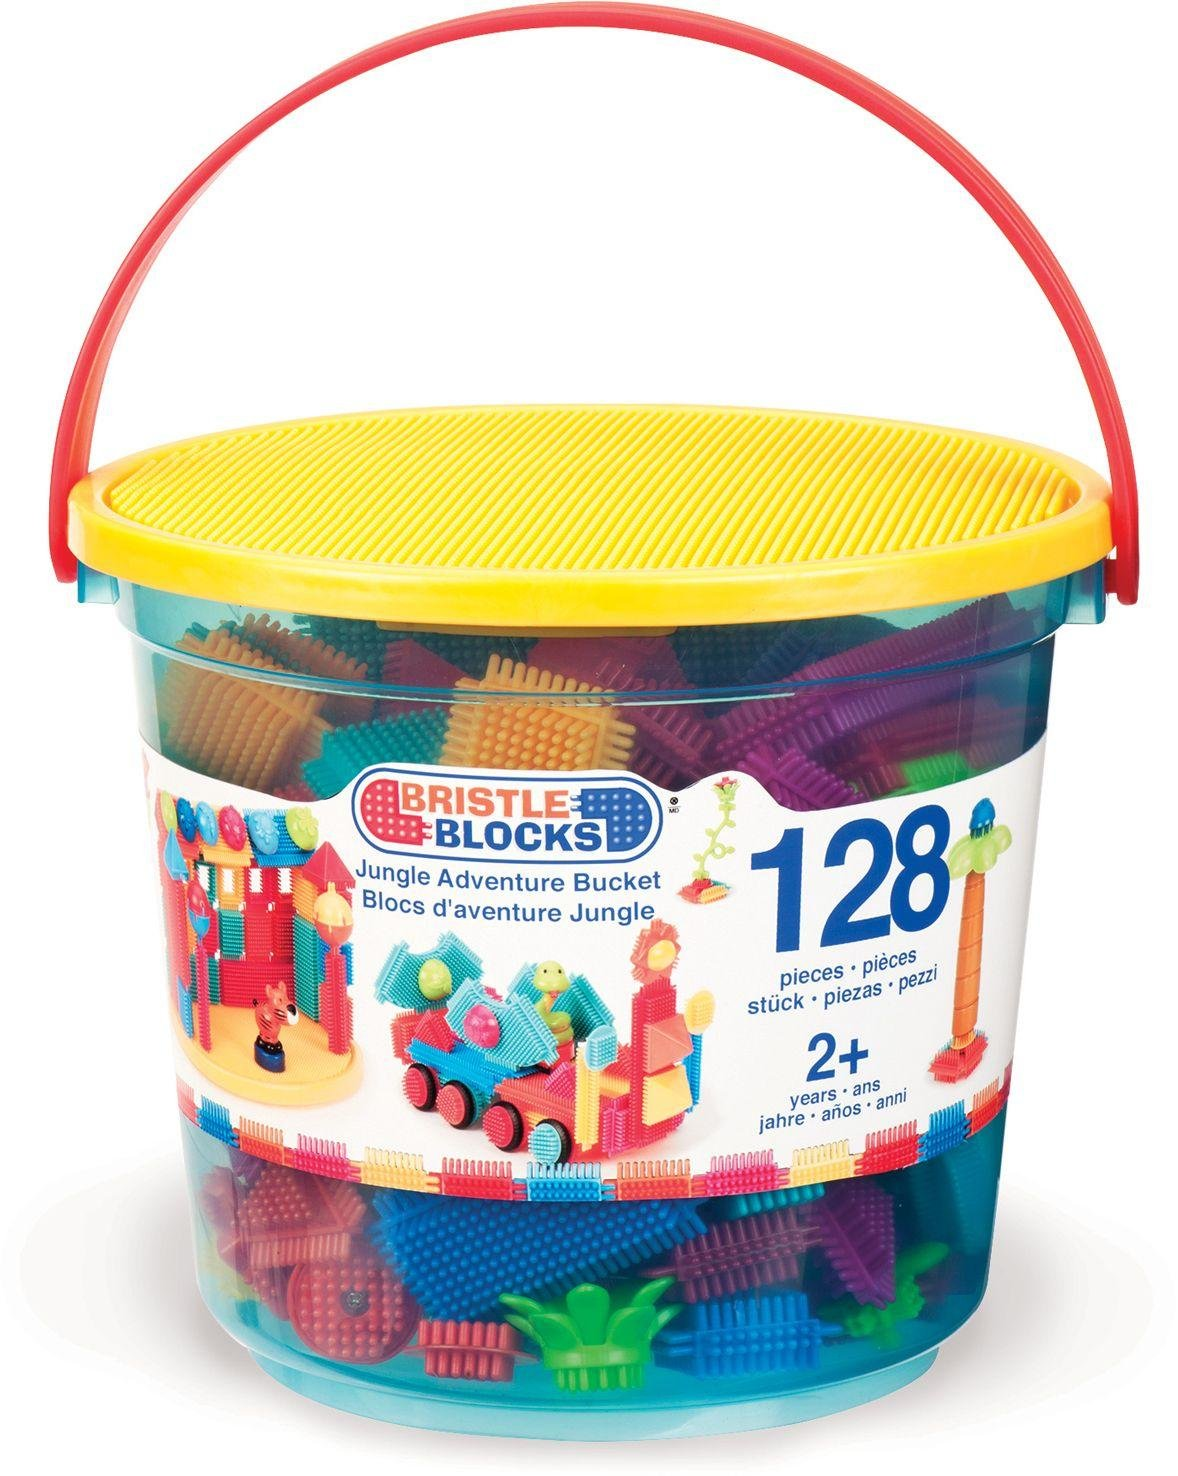 Image of Bristle Blocks Jungle Adventure Storage Bucket - 128 Pieces.